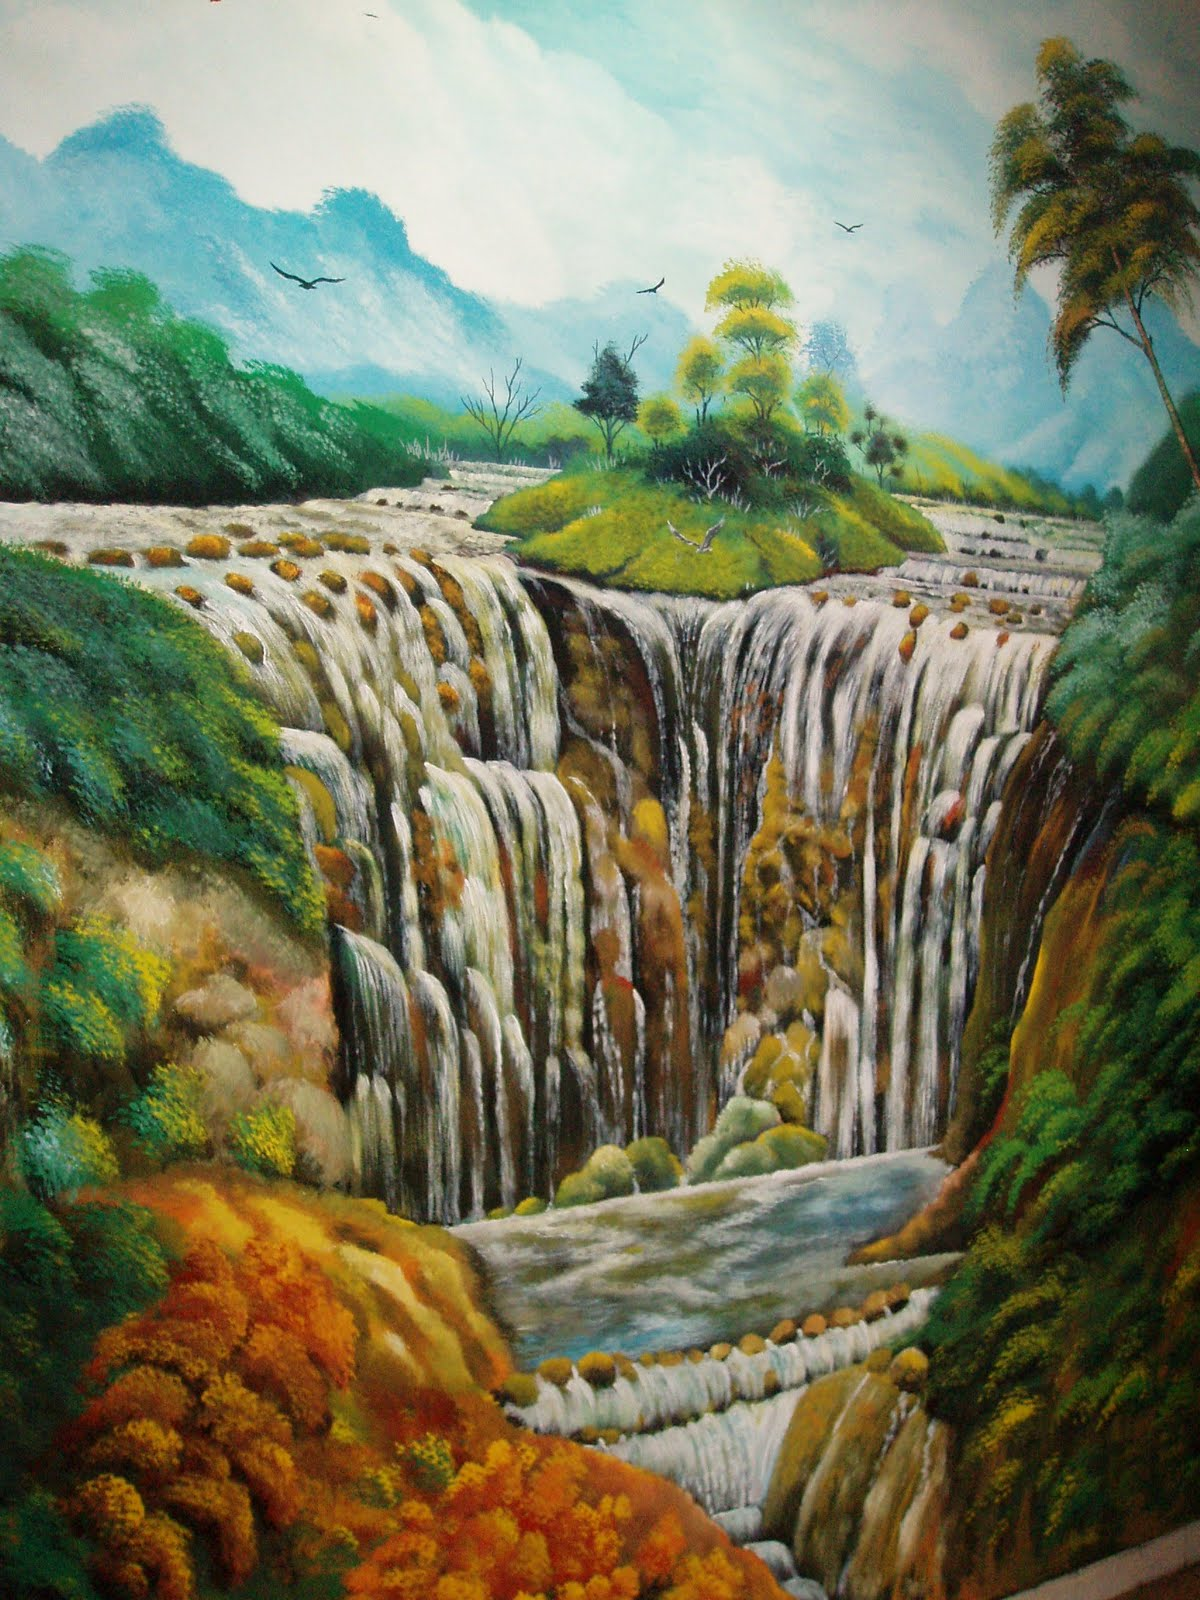 Pelukis mural shah alam restoren jom makan subang perdana for Mural sekolah rendah